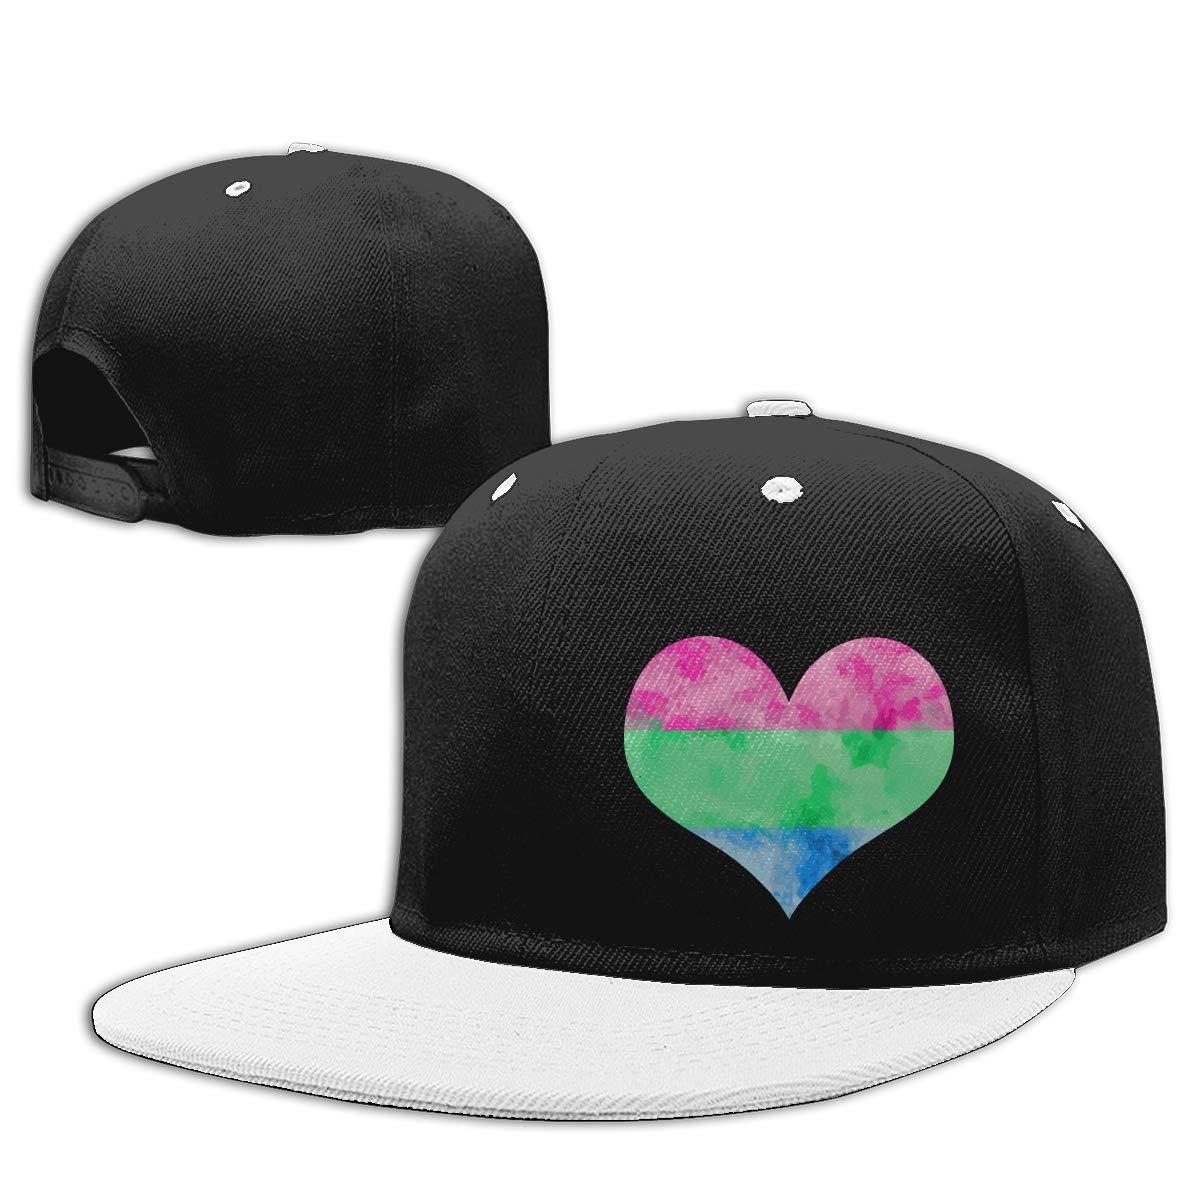 Men and Women Punk Rock Cap Poly Pride Heart Adults Flat Bill Baseball Caps